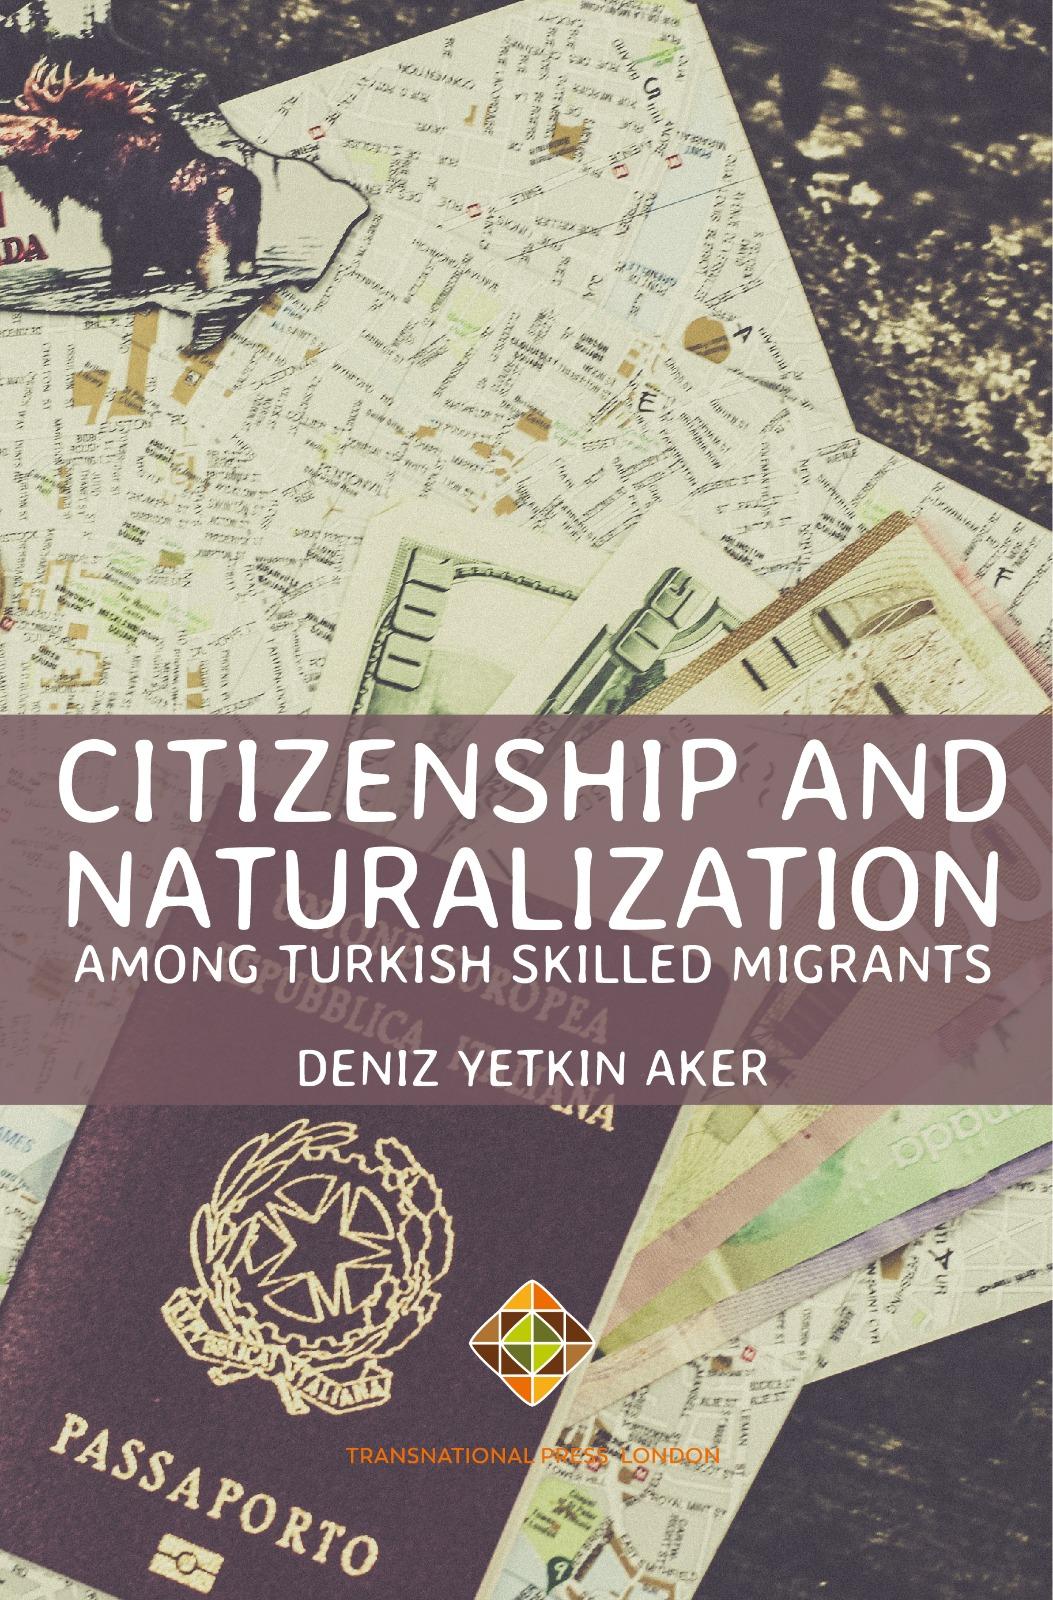 Citizenship and Naturalization among Turkish Skilled Migrants